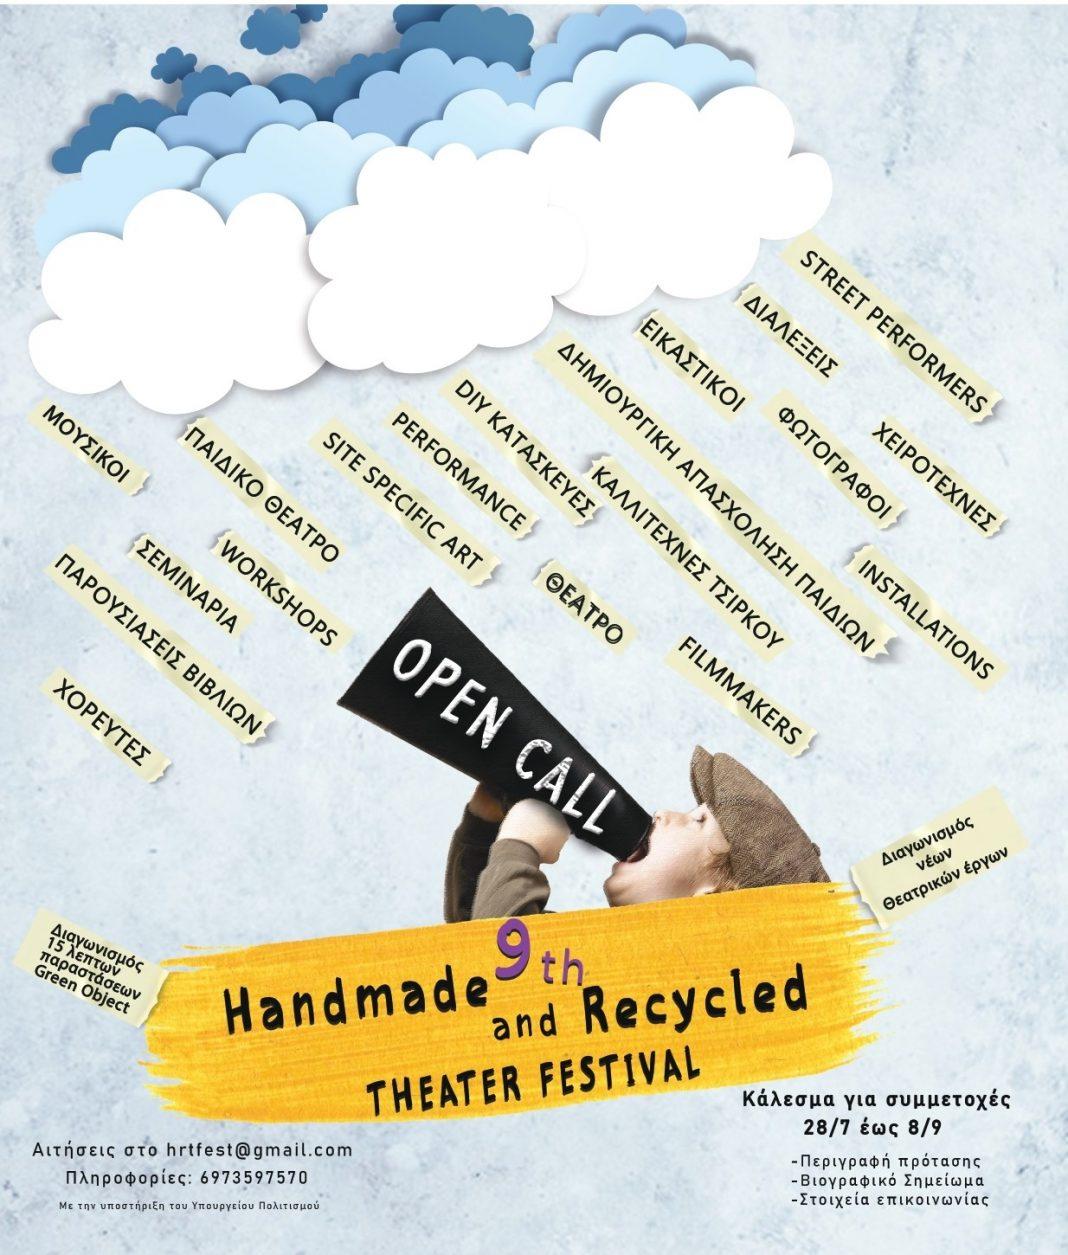 9th Handmade & Recycled Theater Festival Open Call   Ανοιχτό κάλεσμα συμμετοχής